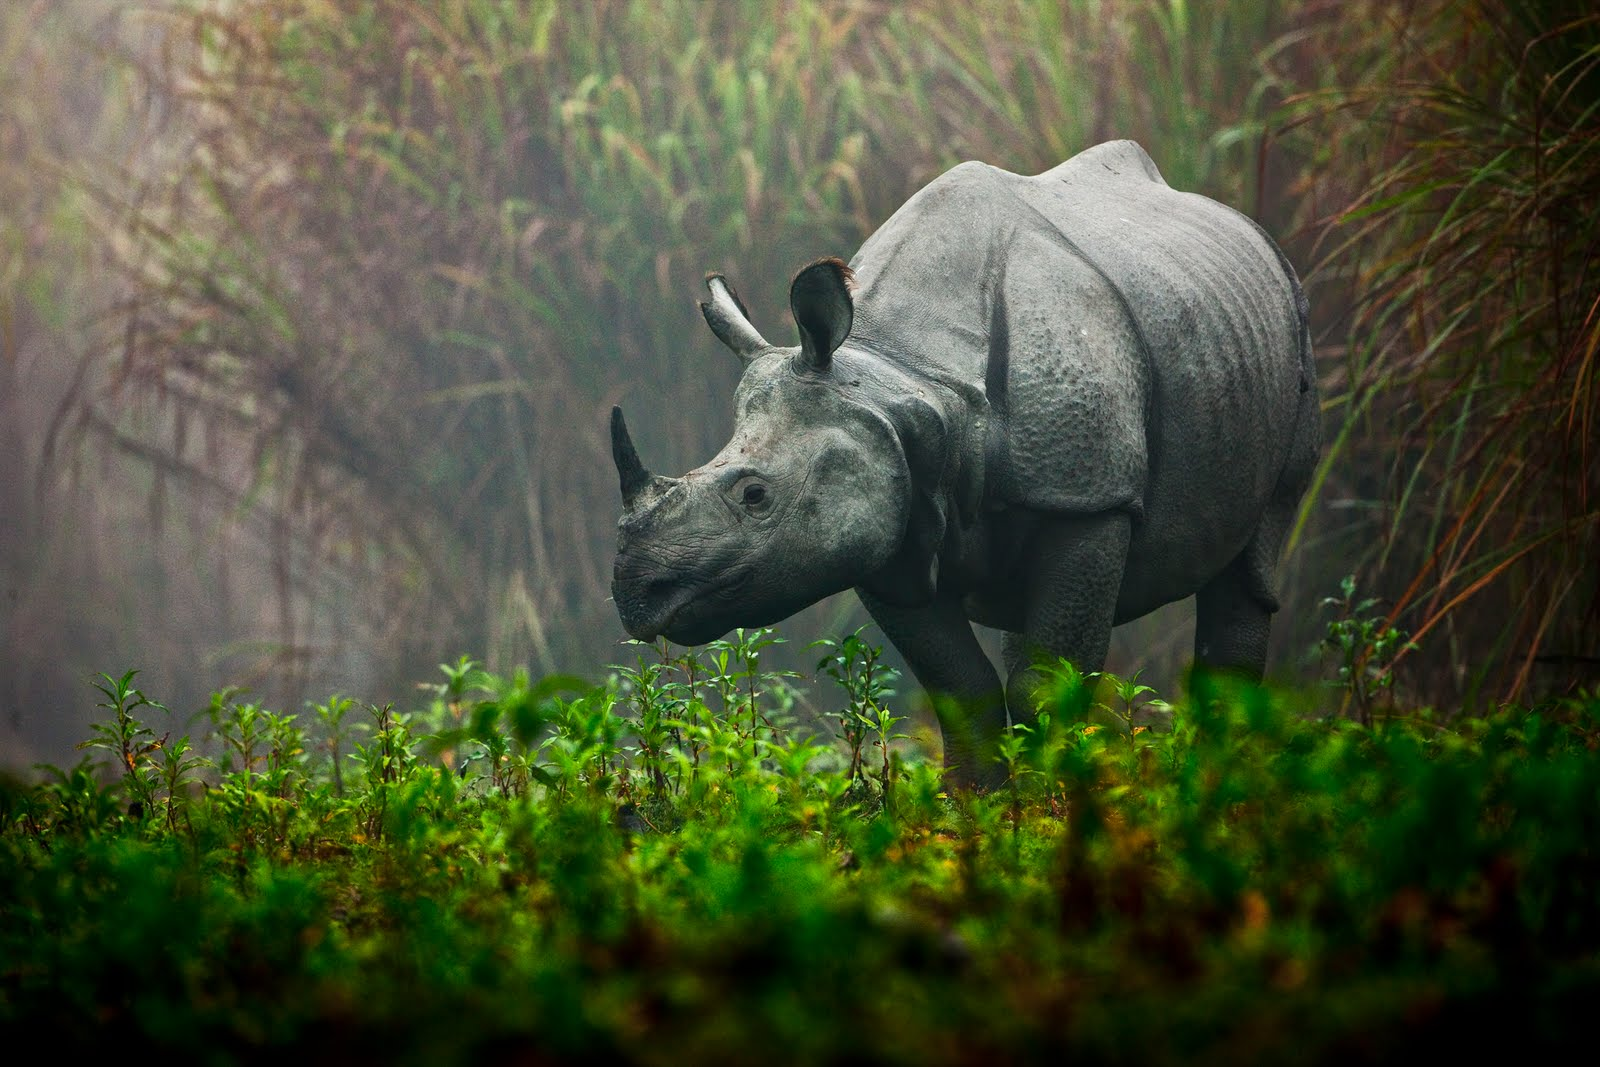 http://2.bp.blogspot.com/_LSib8N9sSgU/TDi47uAlPfI/AAAAAAAAAEI/1stWrBBii6c/s1600/wildlife_uri_golman.jpg